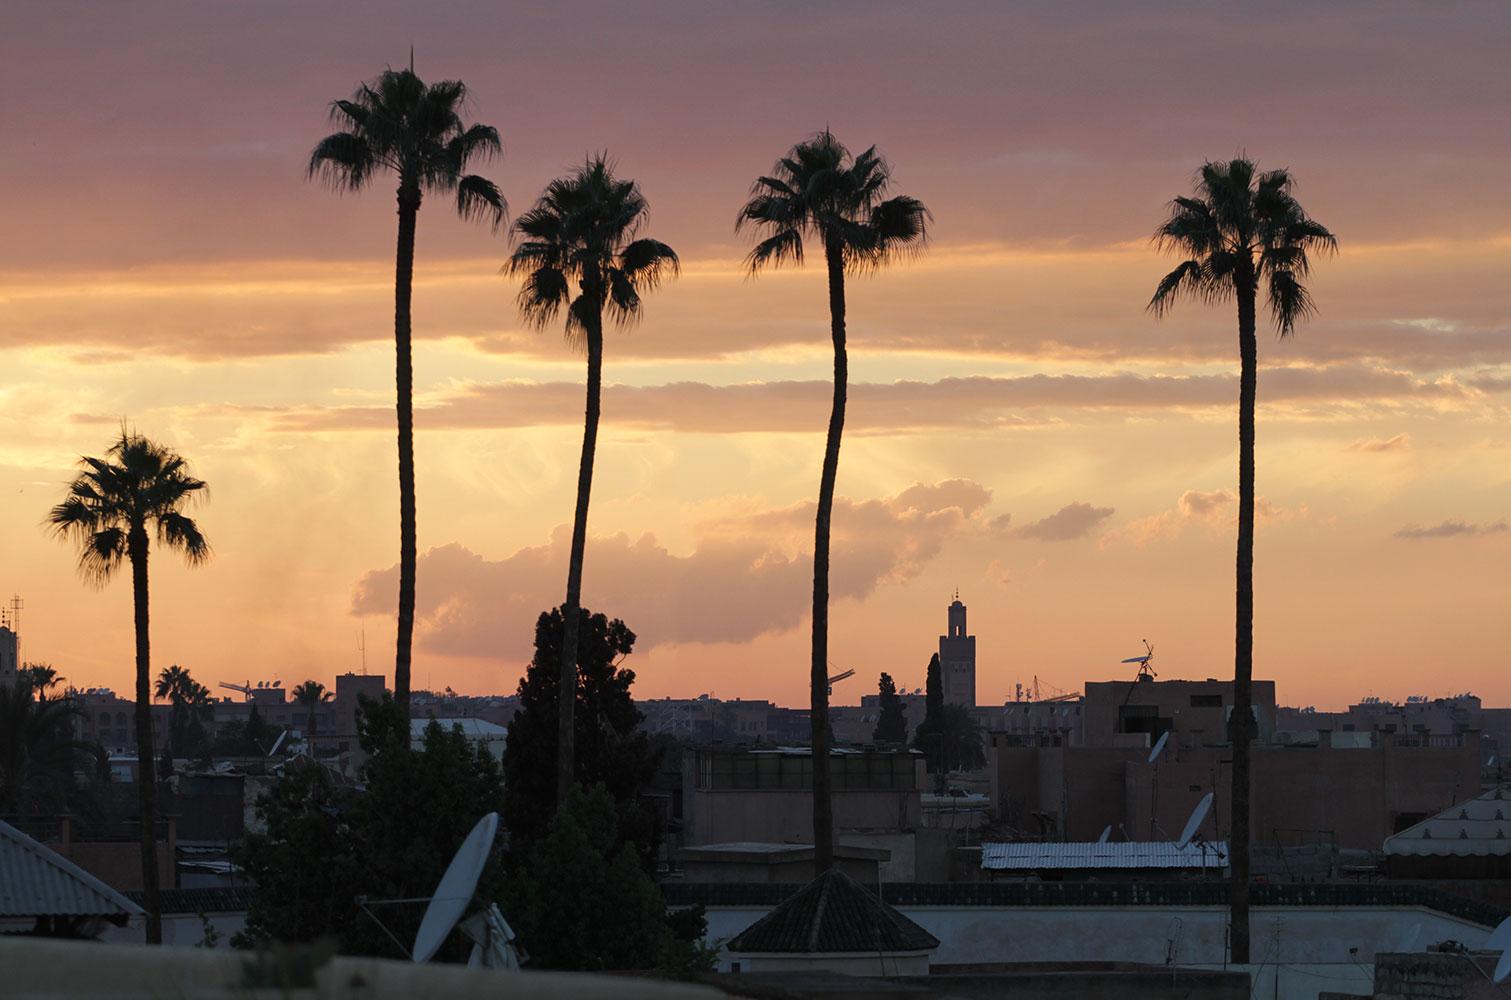 bg-pics-sky-marrakech